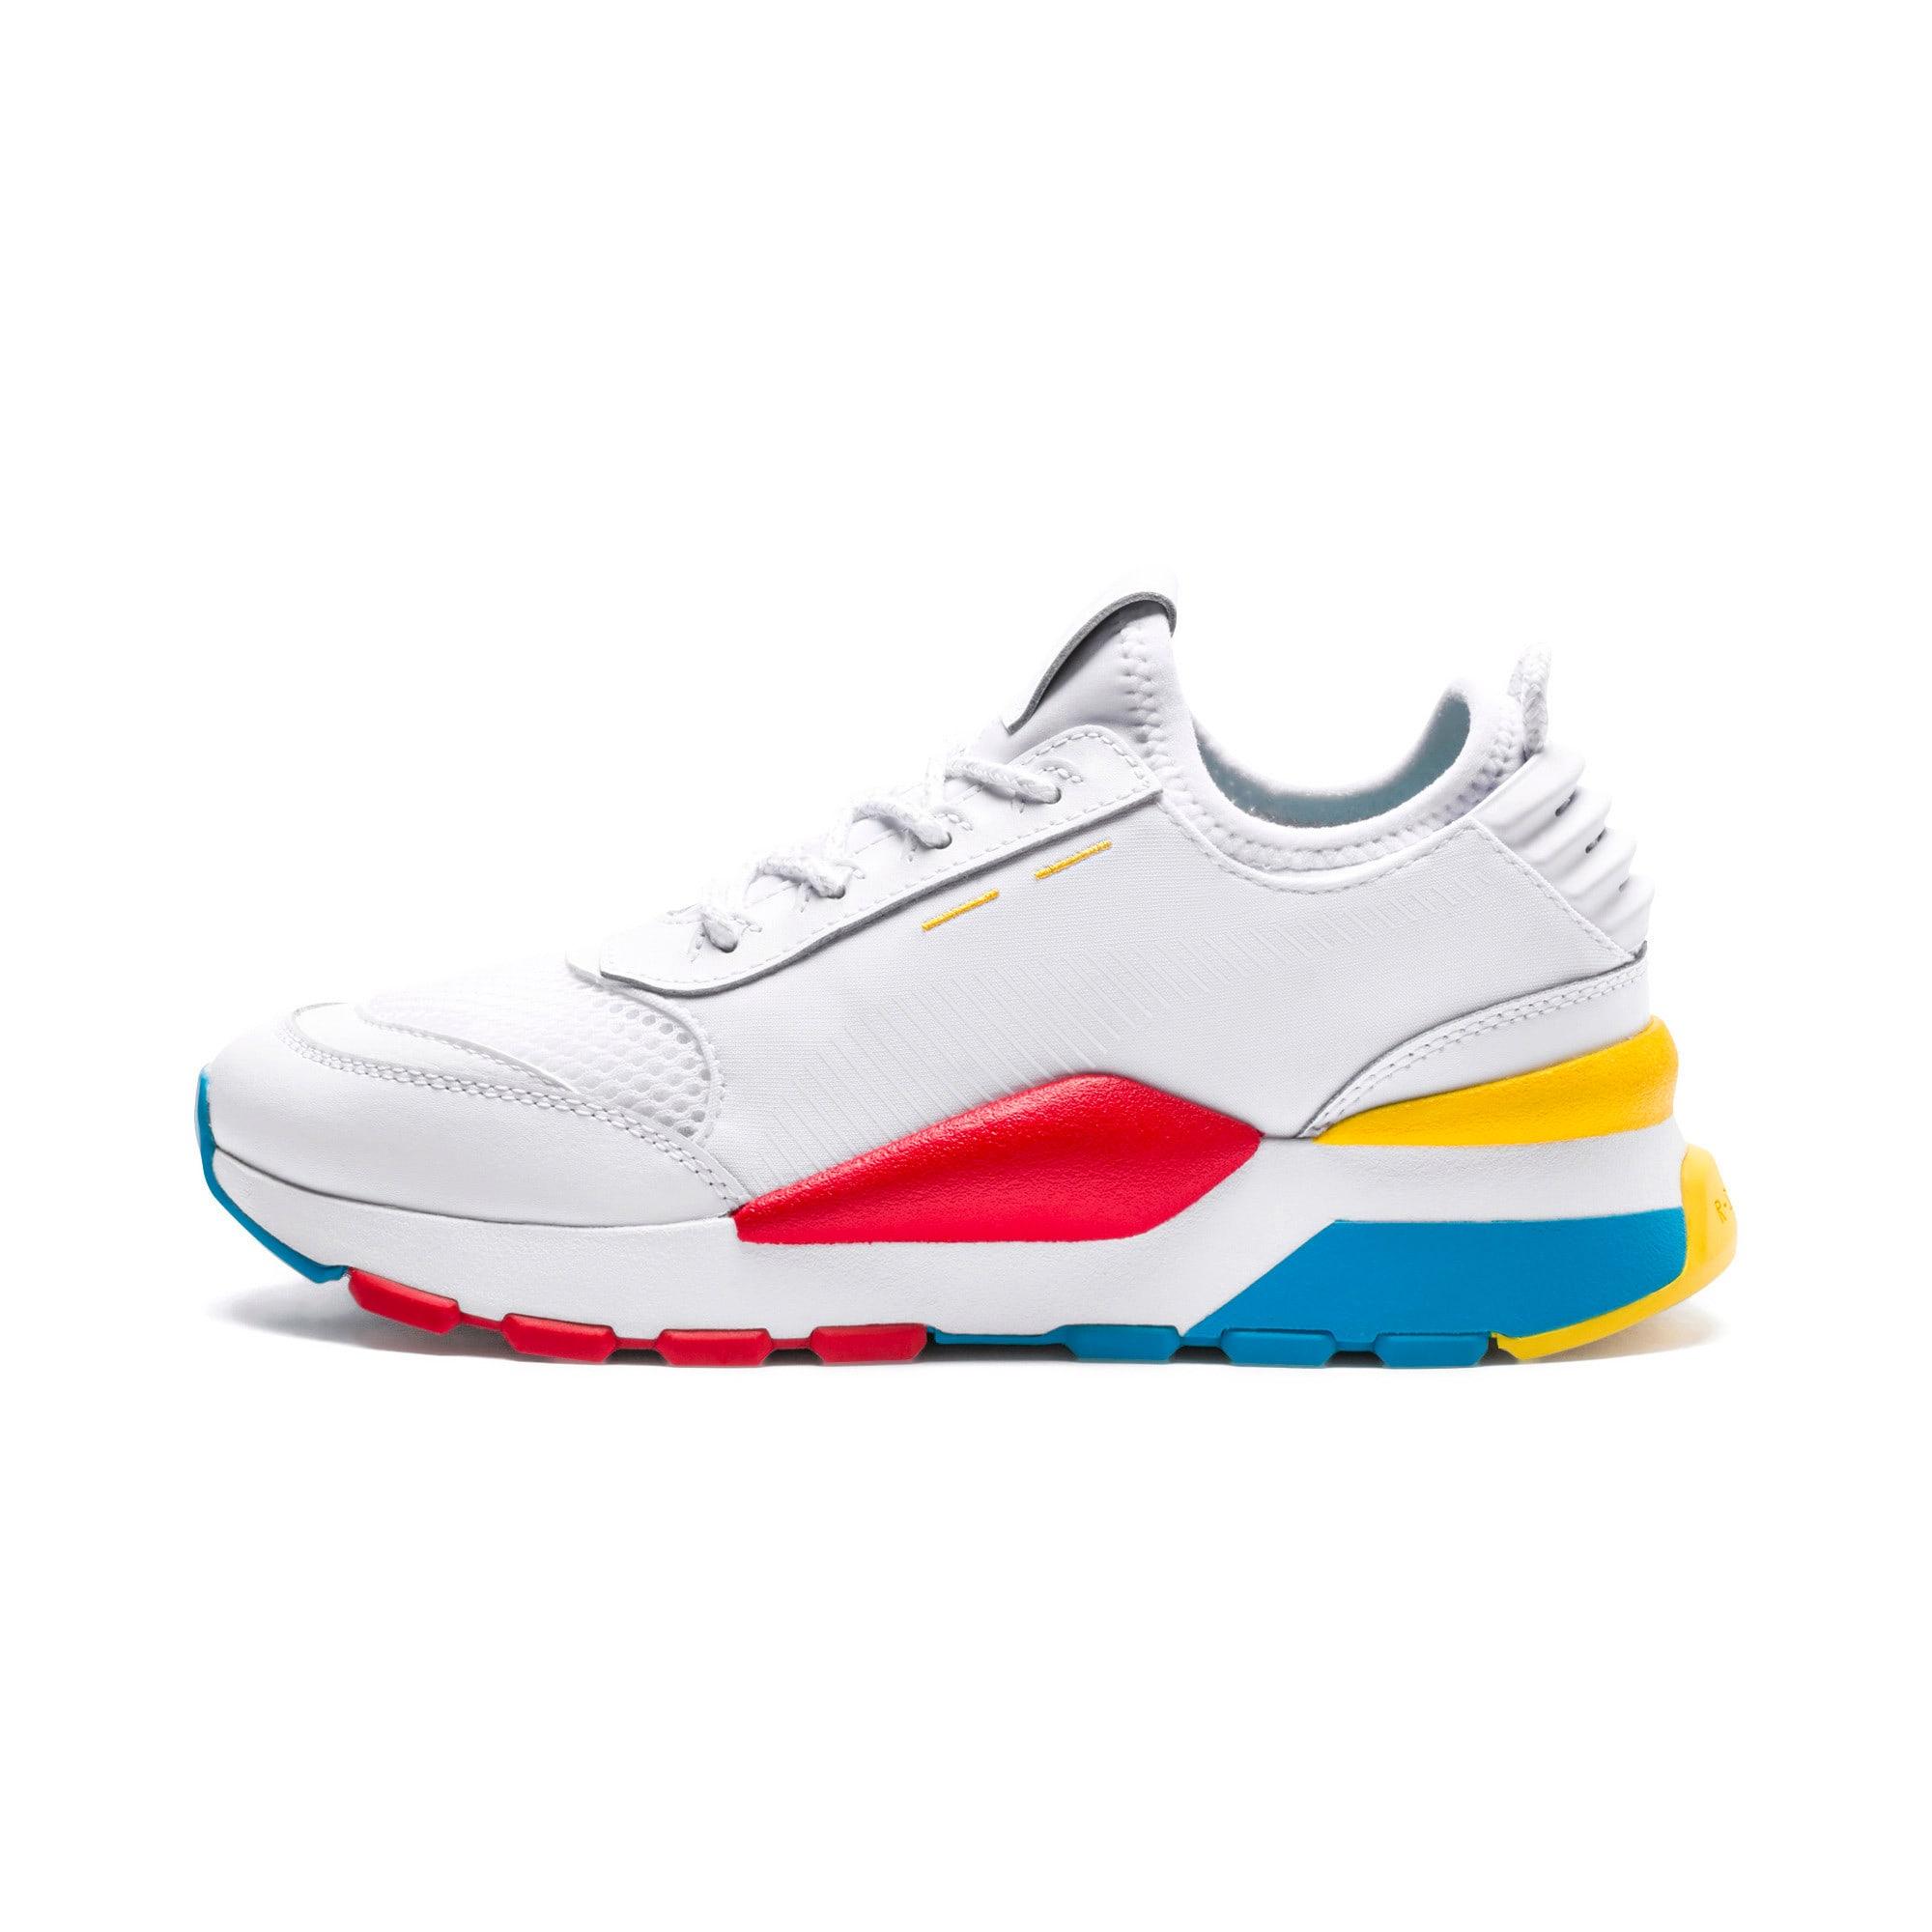 Thumbnail 1 of RS-0 Play Sneakers JR, White-Puma White-White, medium